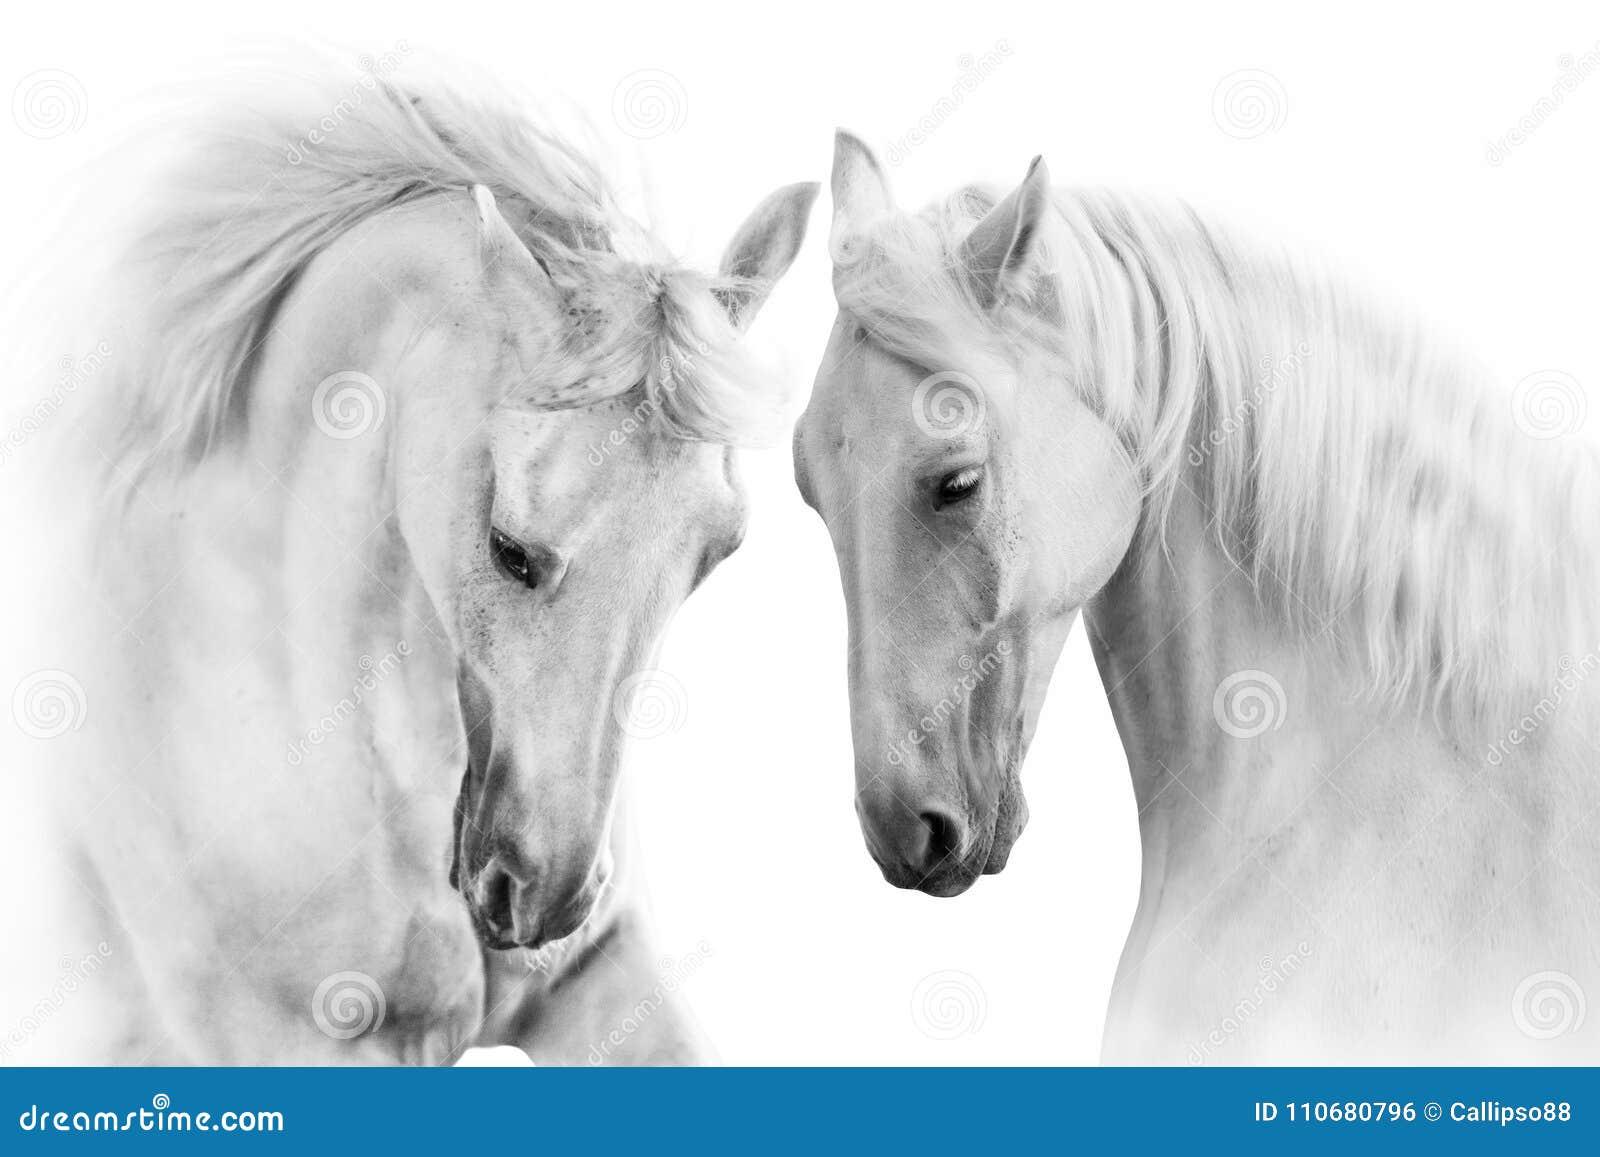 White Horses With Long Mane Stock Photo Image Of Beautiful Curious 110680796